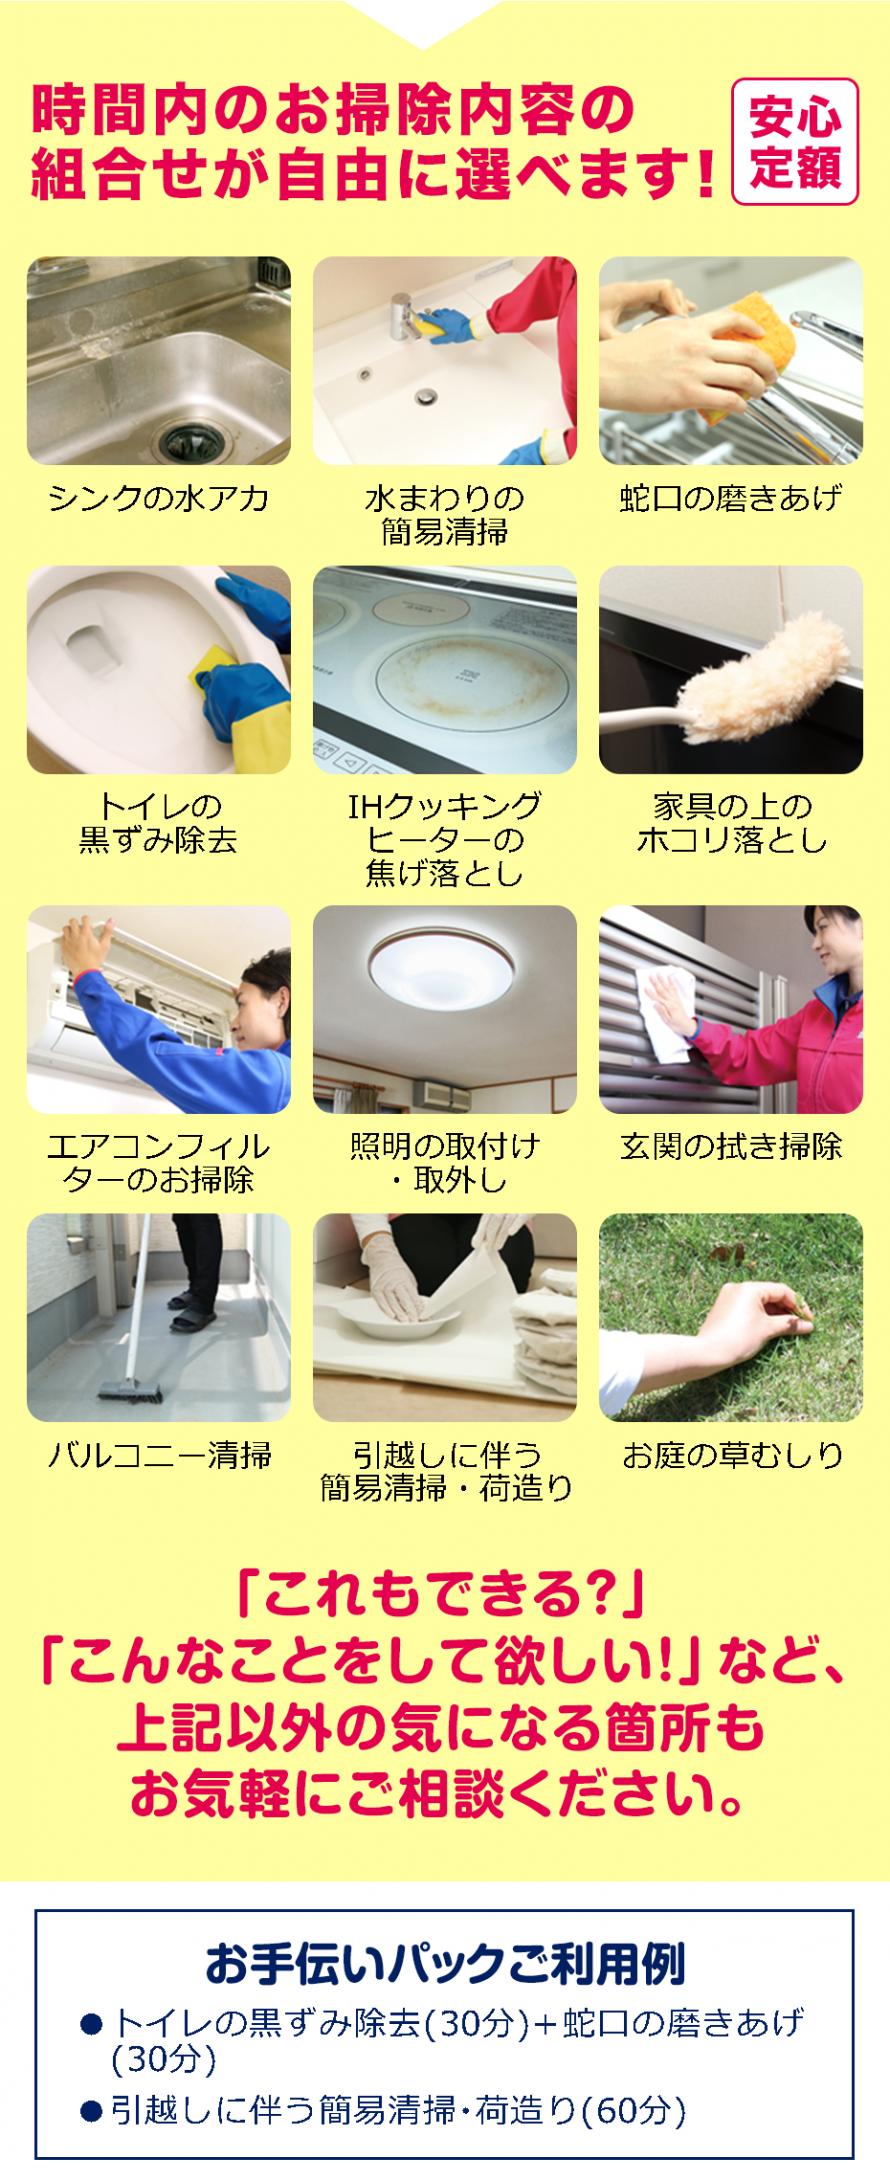 CP_180301tohoku_02